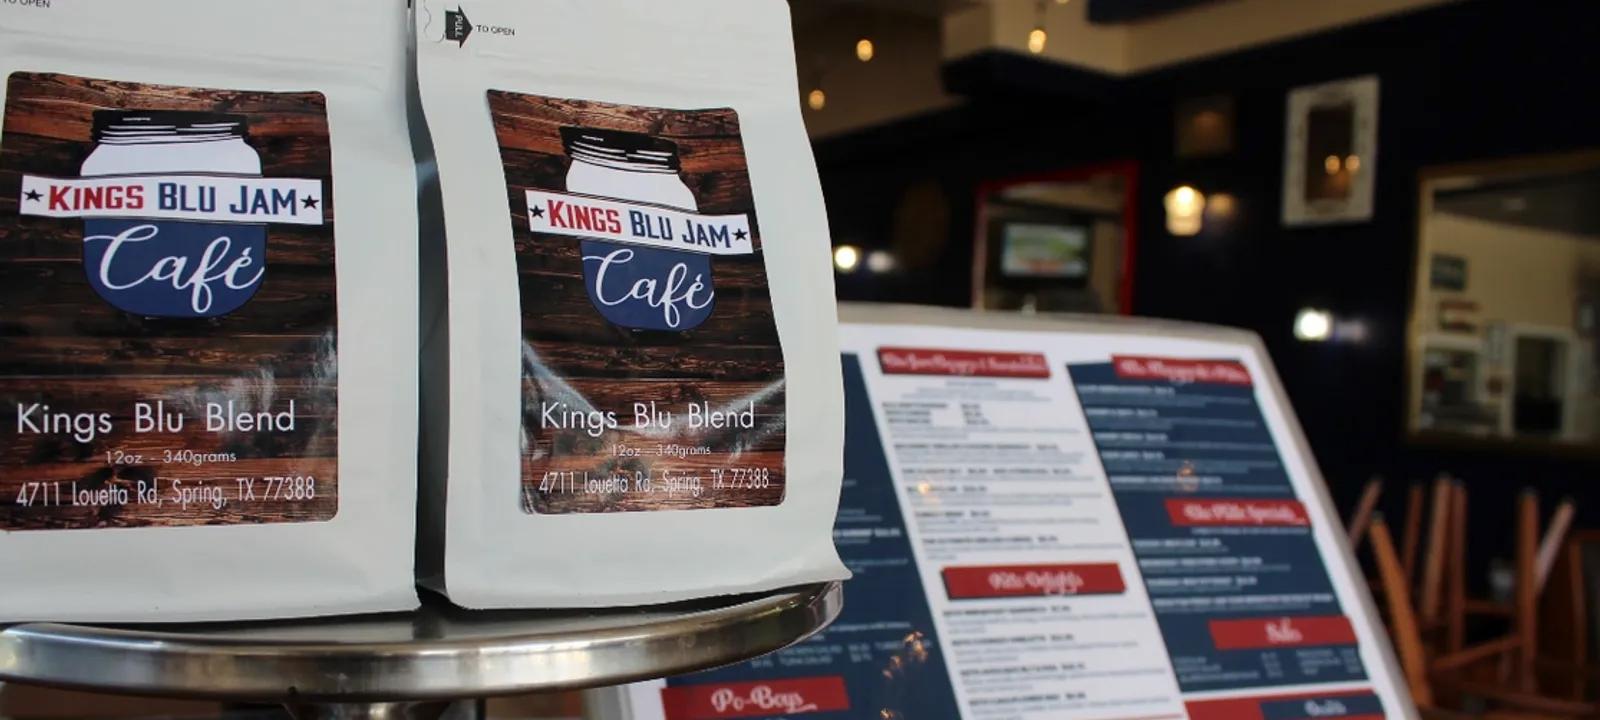 marketing-kings-blu-jam